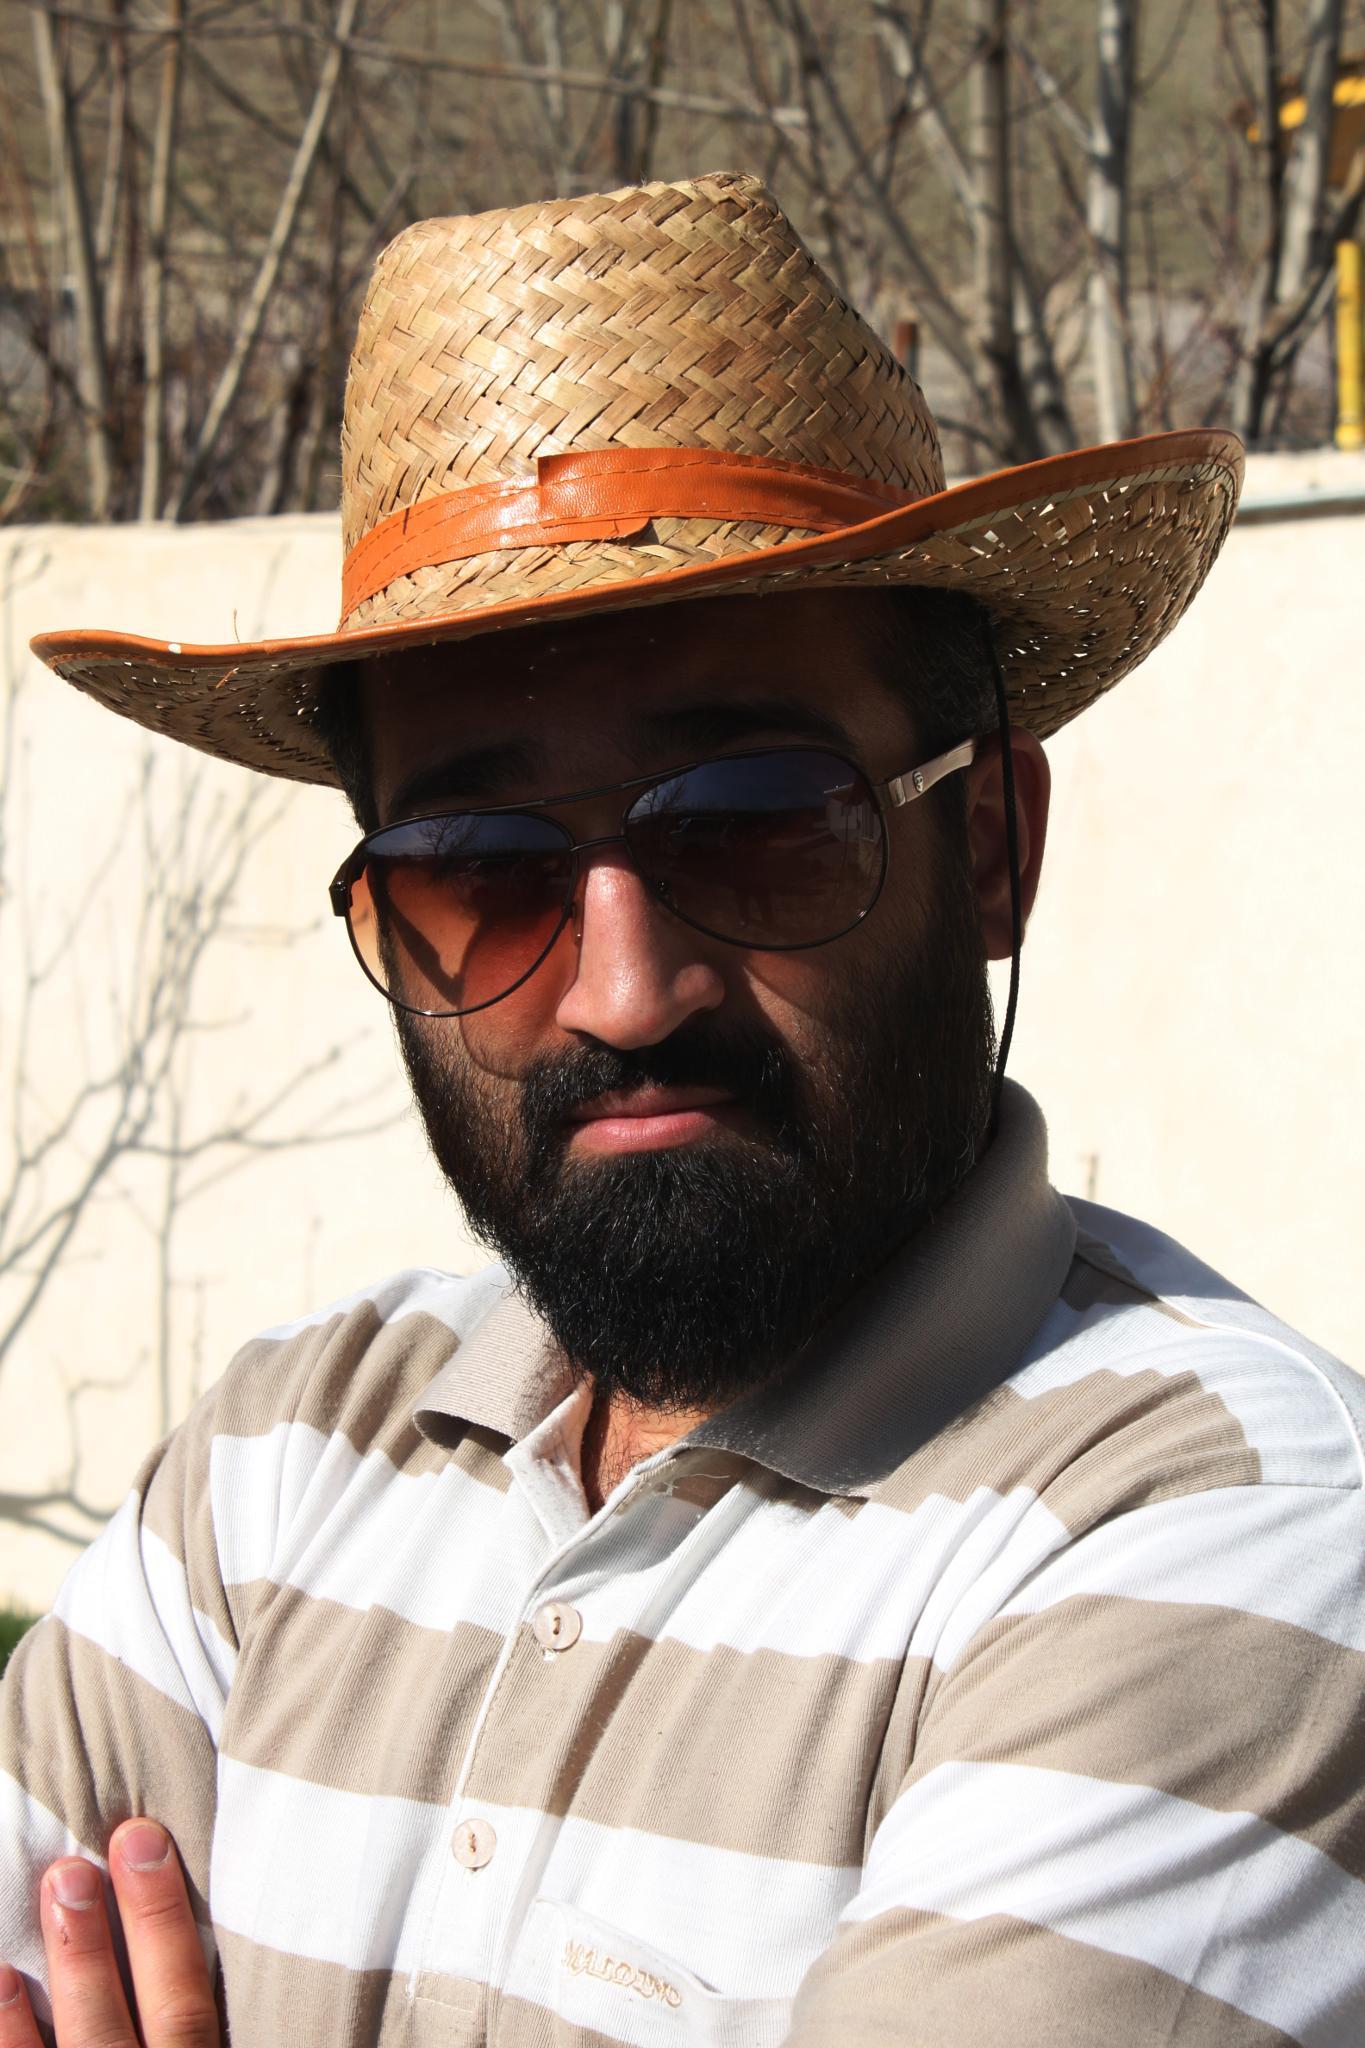 Mr. Hat by Mahdi Ebrahimi